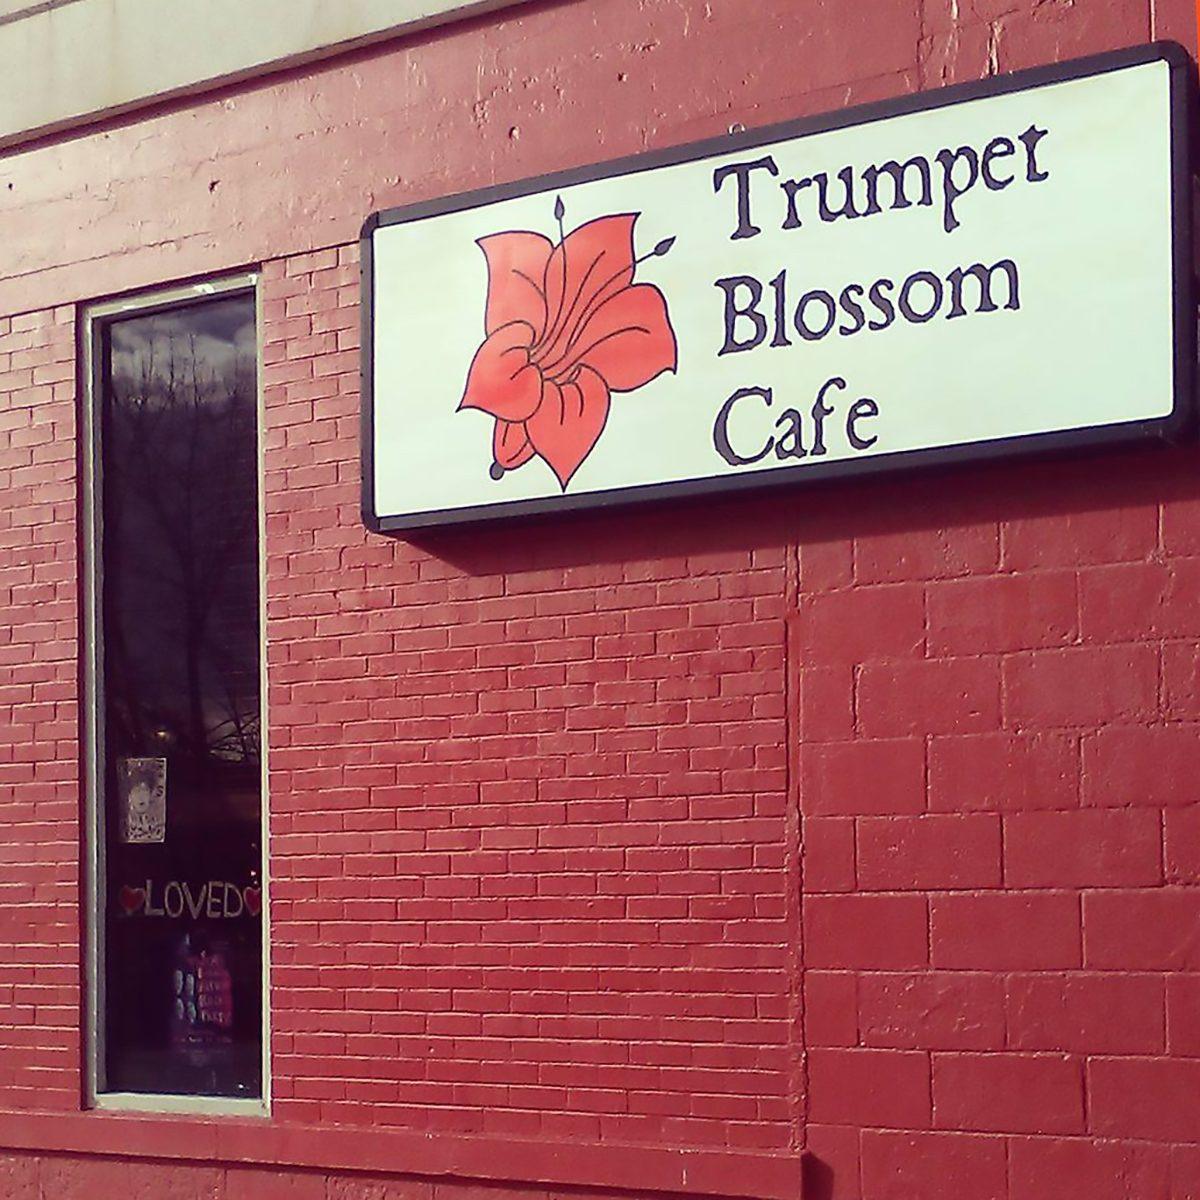 Best vegetarian and vegan restaurant in Iowa Trumpet Blossom Cafe